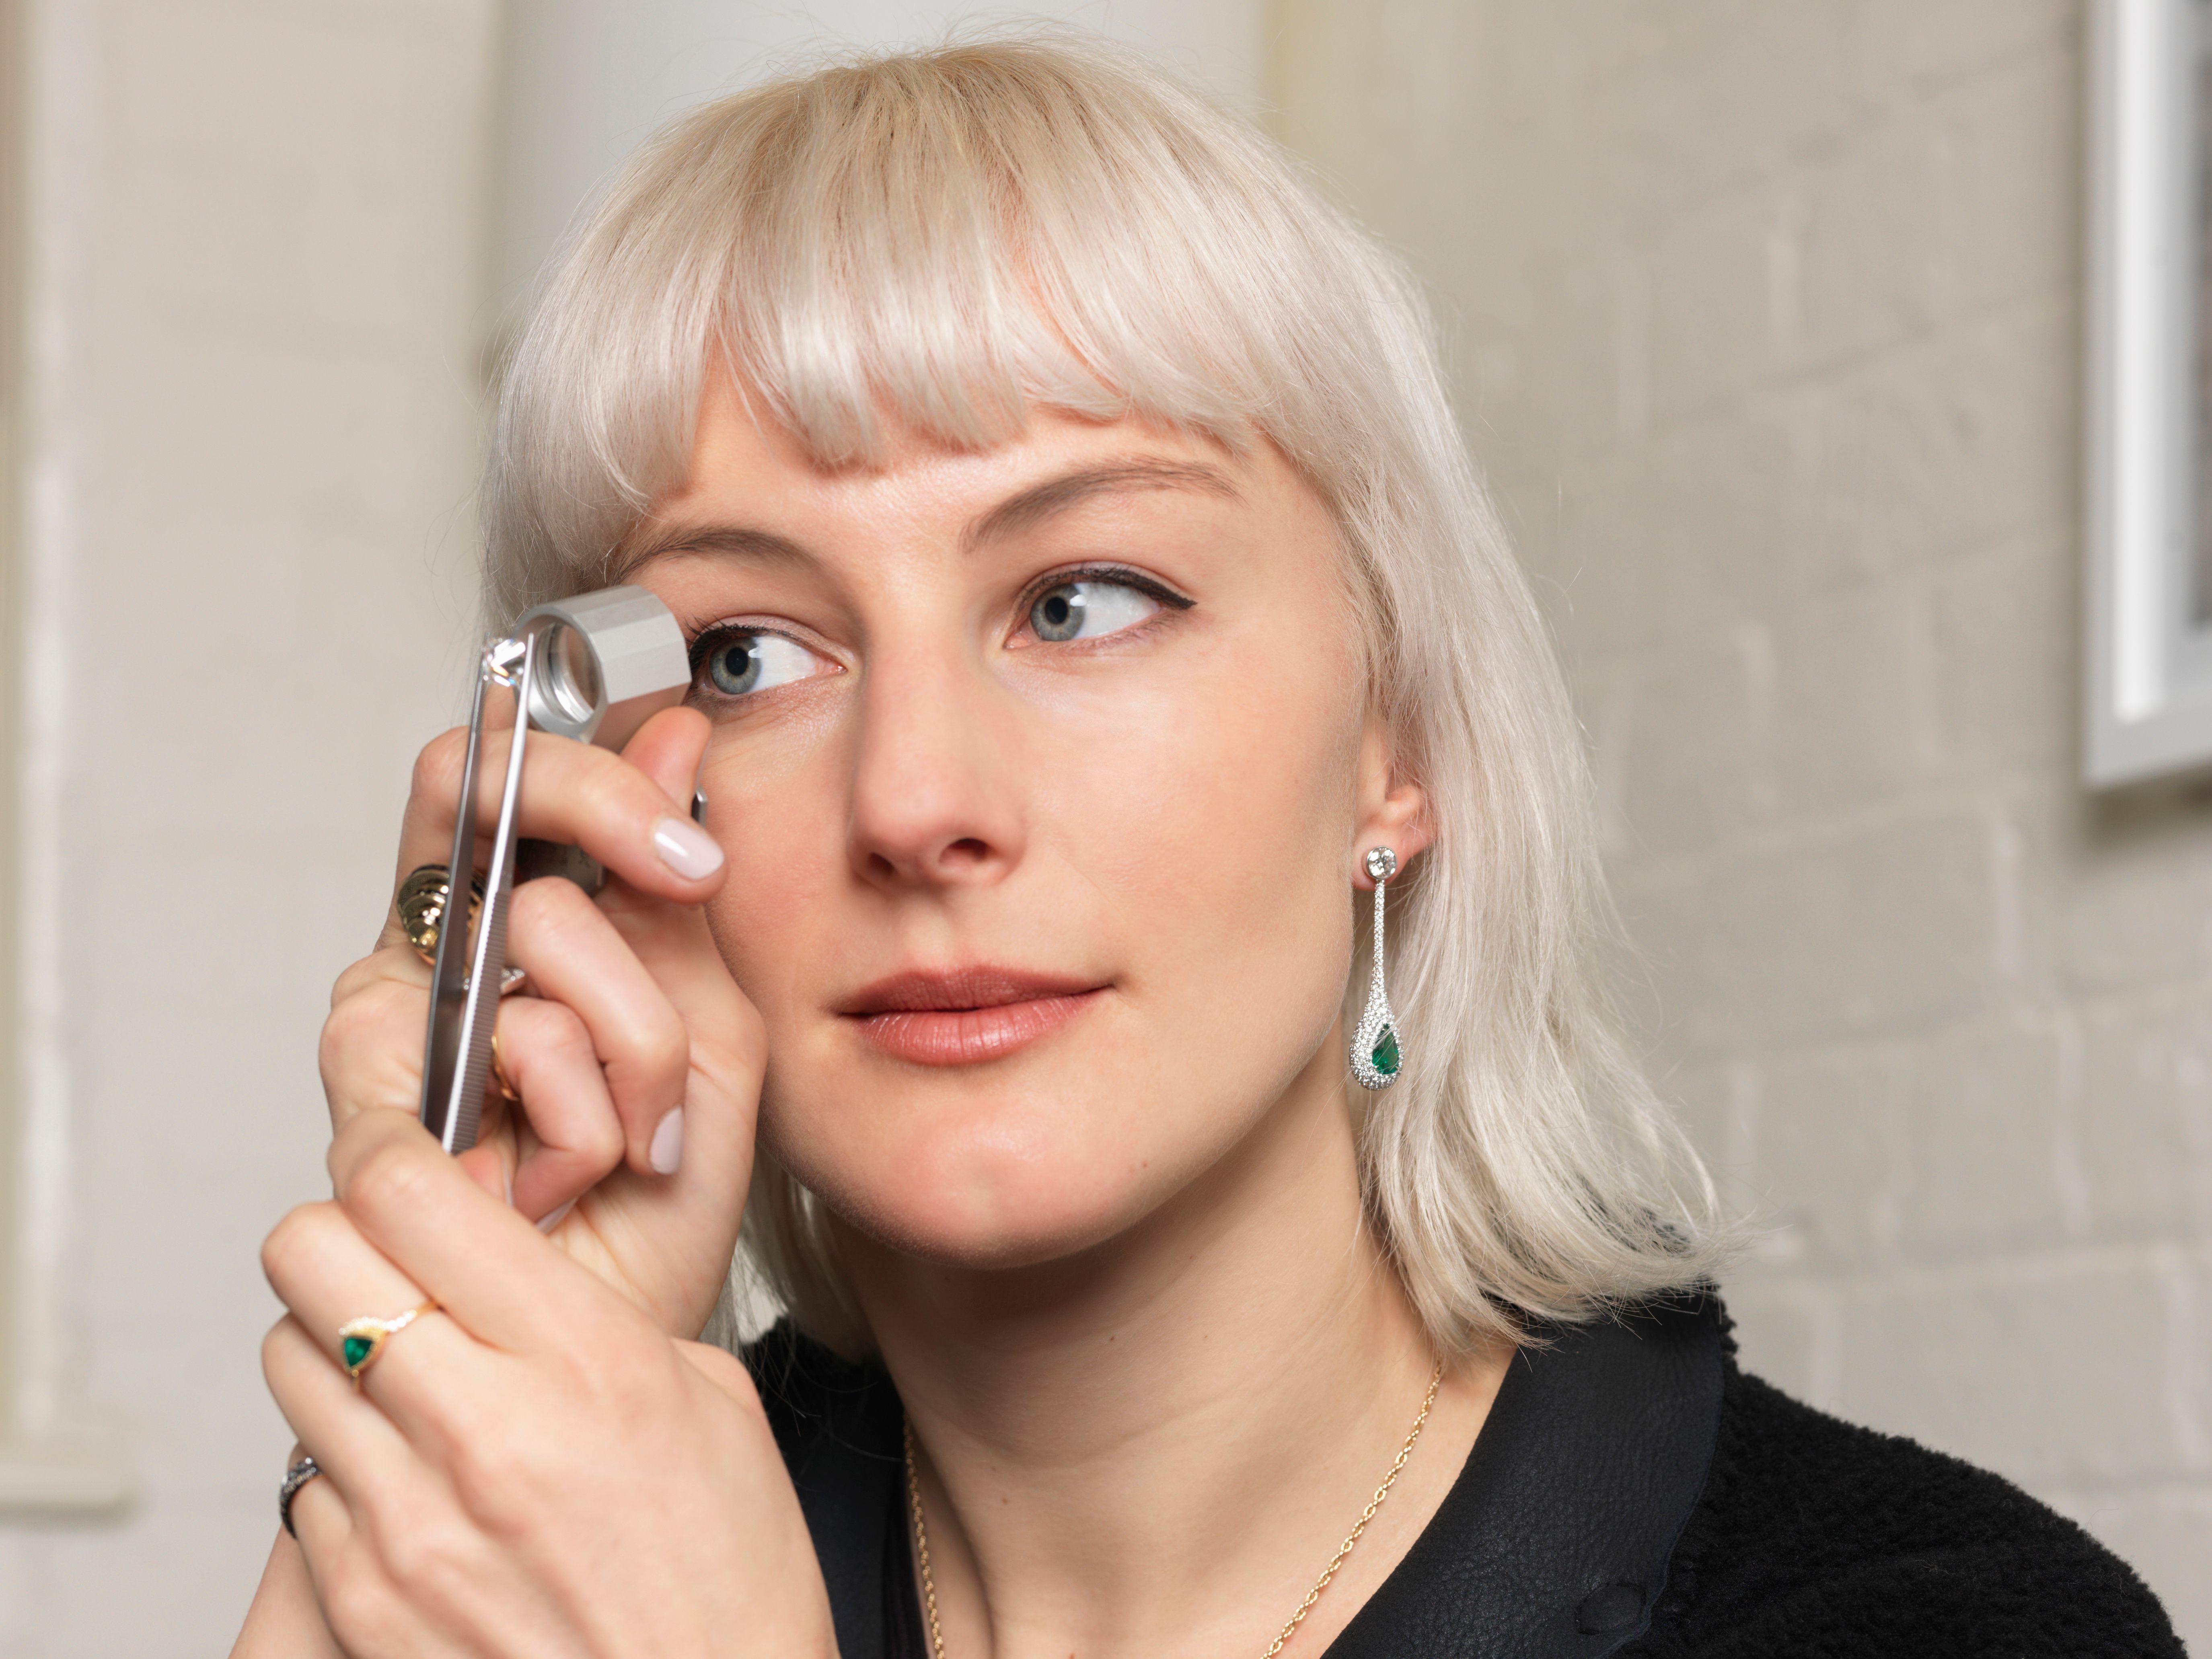 A woman using a jeweler's loupe